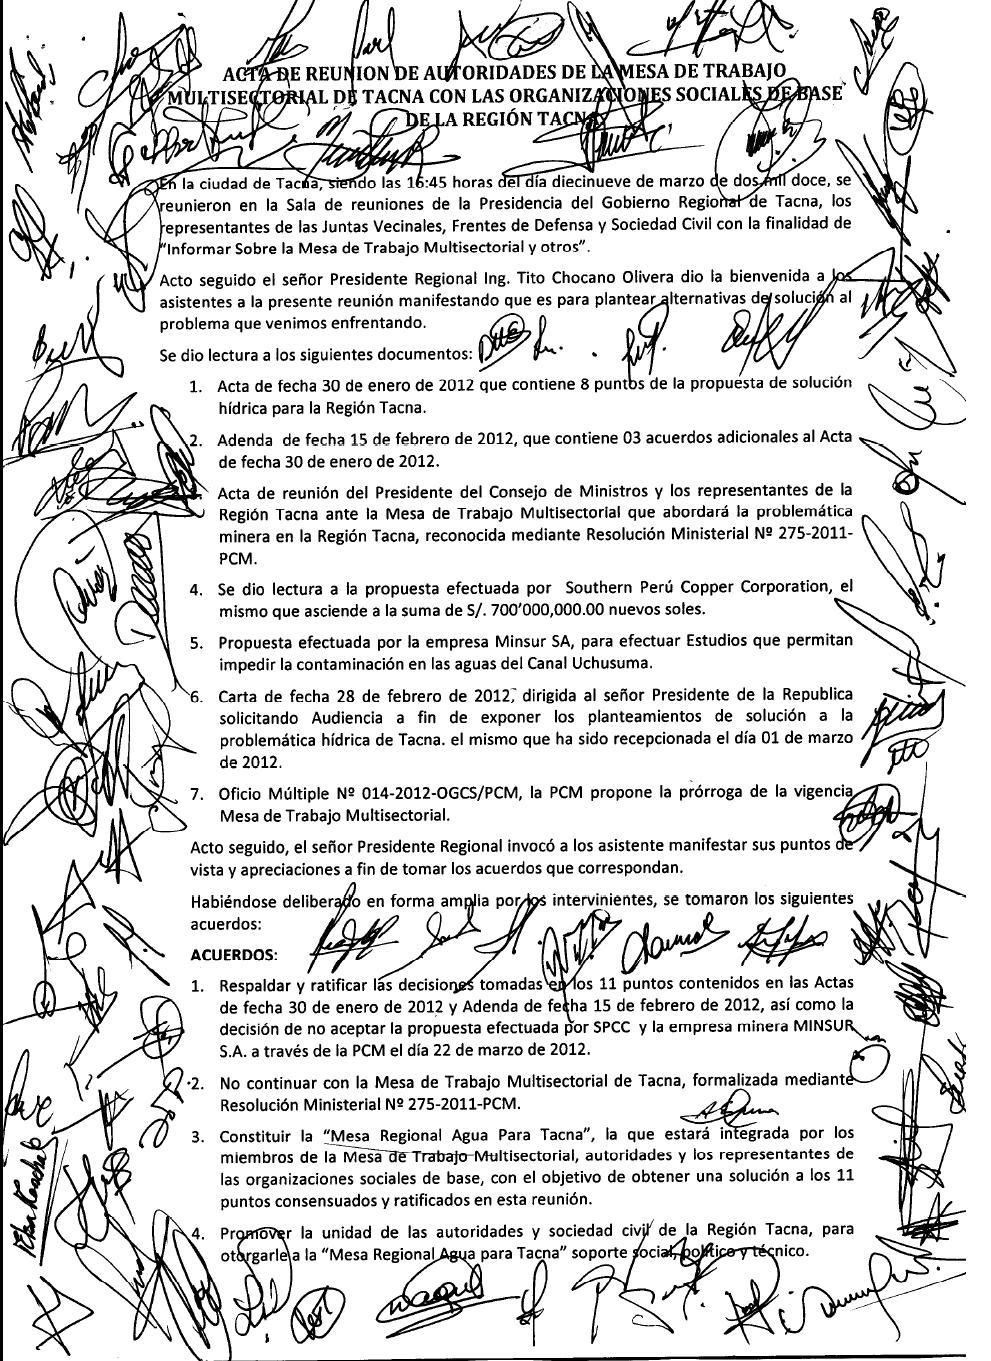 GRUPO INICIATIVA ANTICORRUPCION ILO: 78 personas firman acta que ...